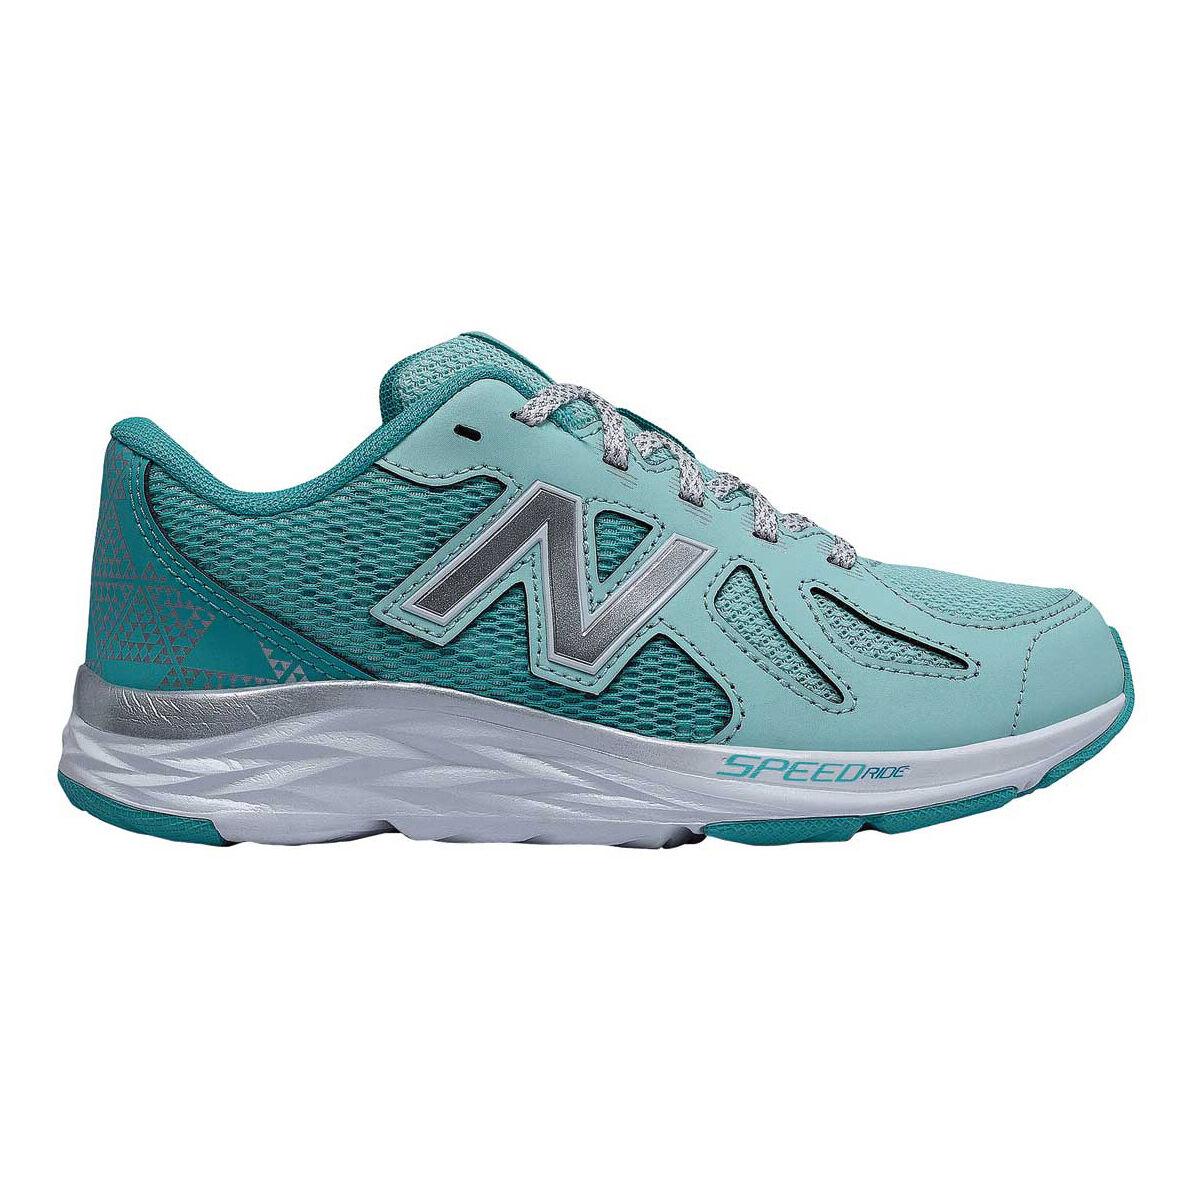 New Balance 790v6 Girls Running Shoes